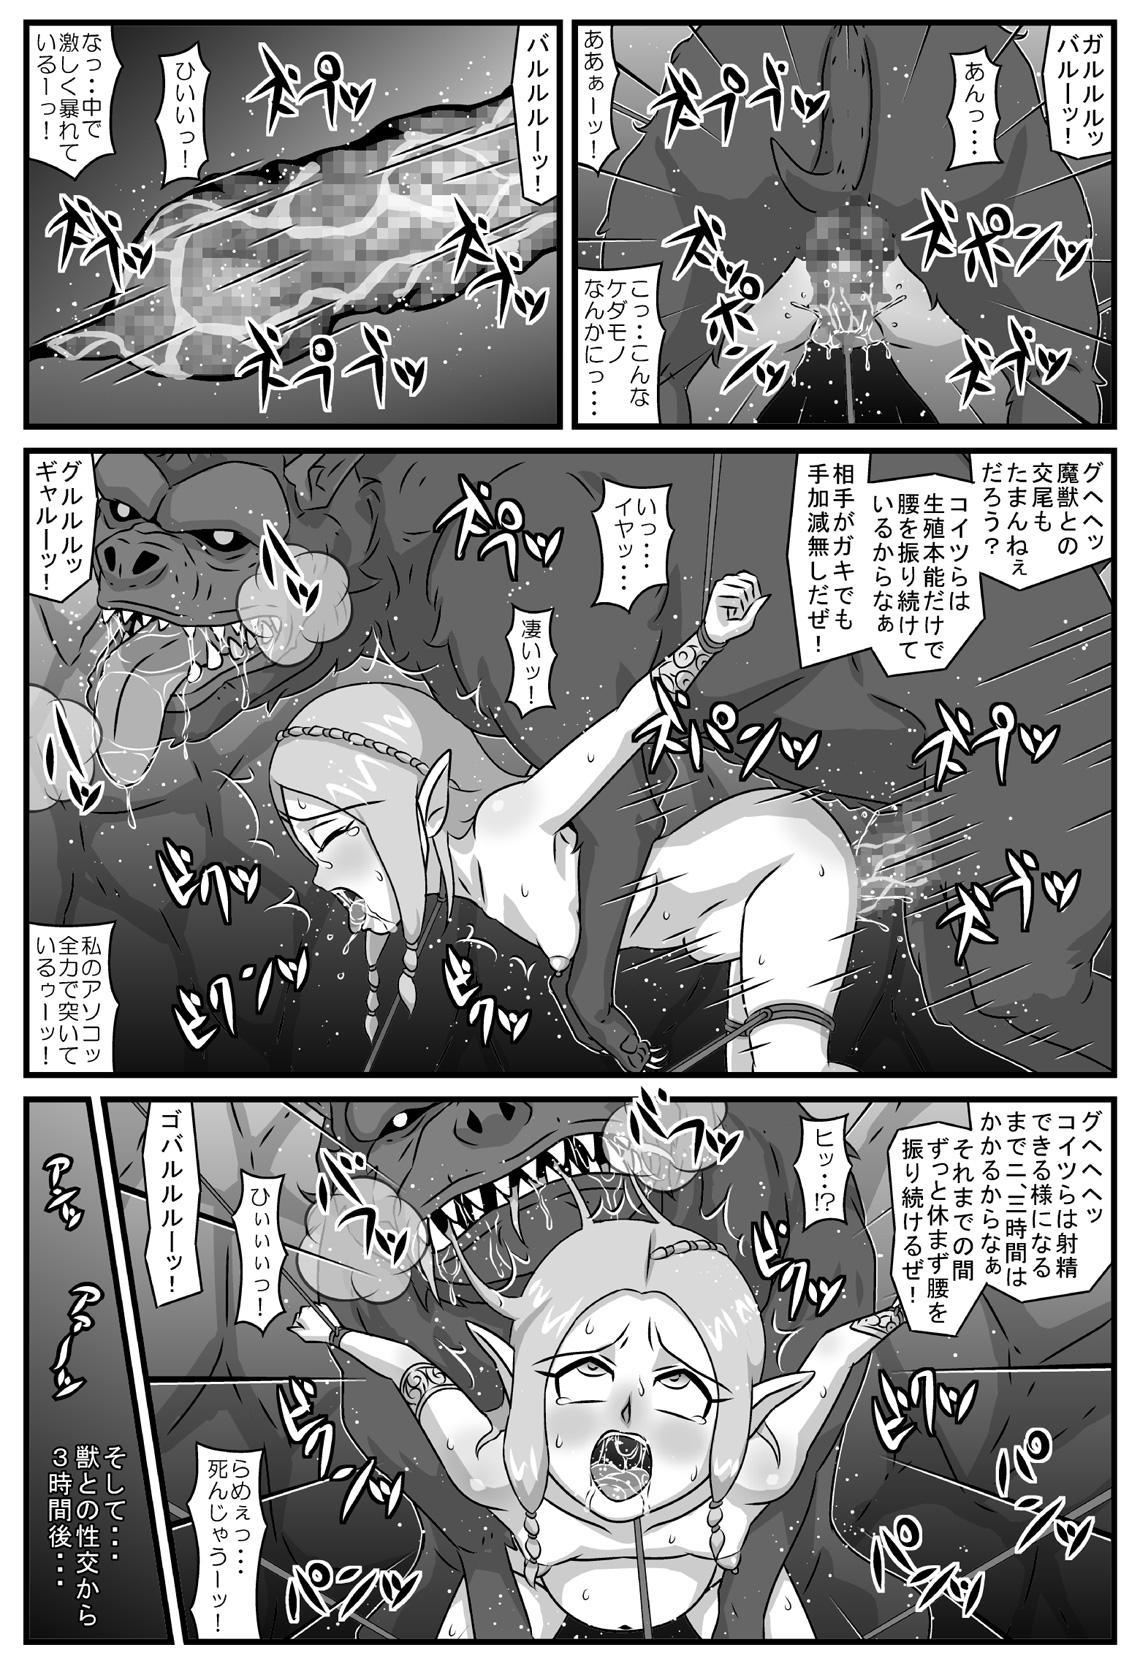 Elf Rinkan ~Kijin-tachi no Seien 20